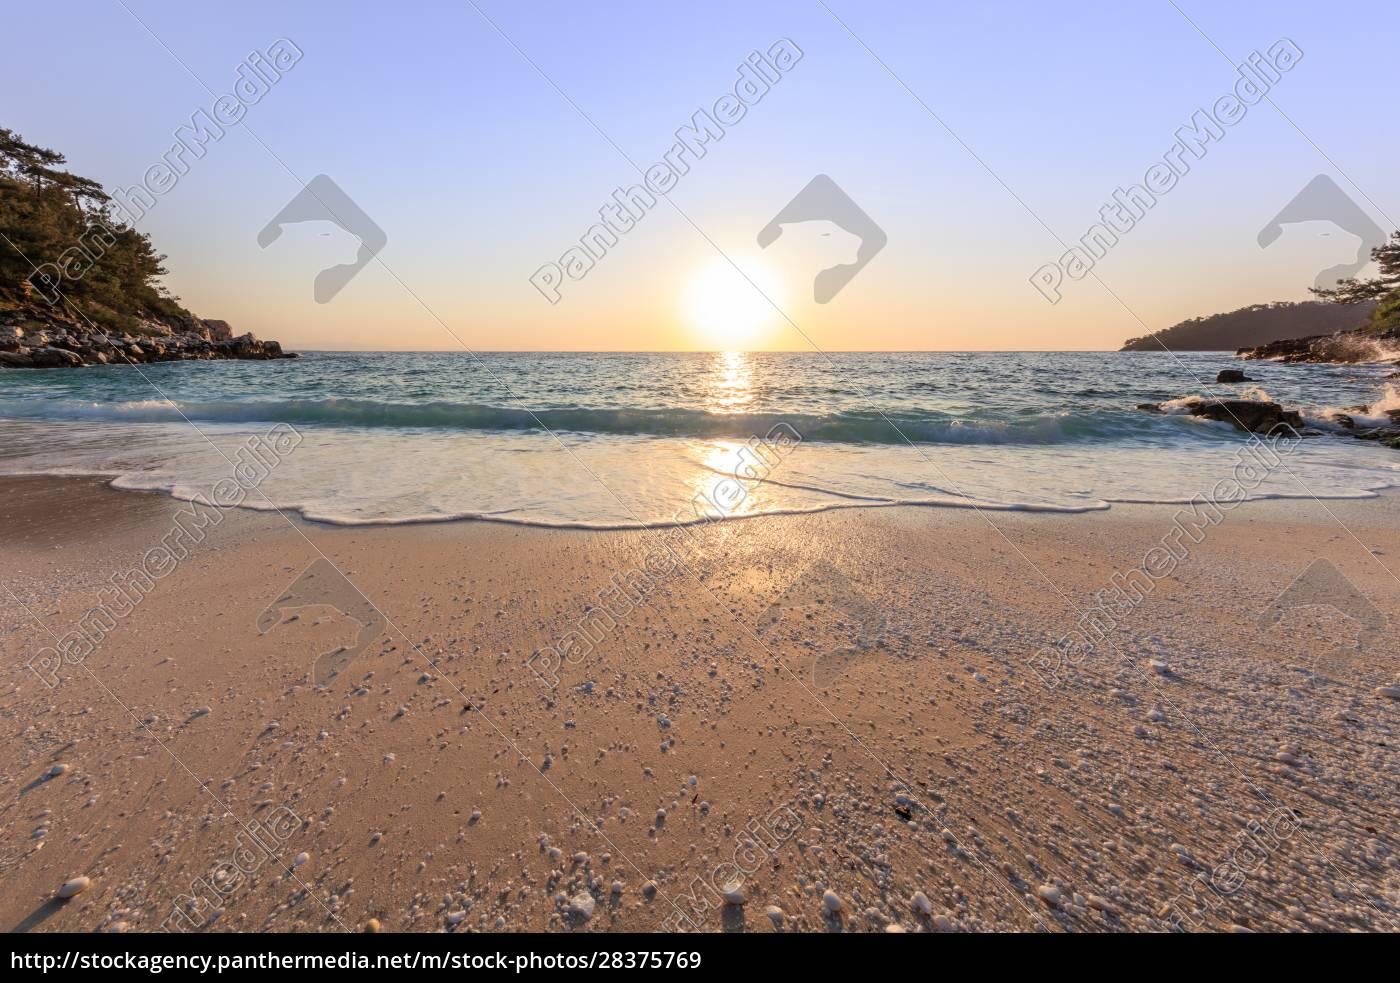 marmorstrand, (saliara, beach), thassos, inseln, griechenland - 28375769